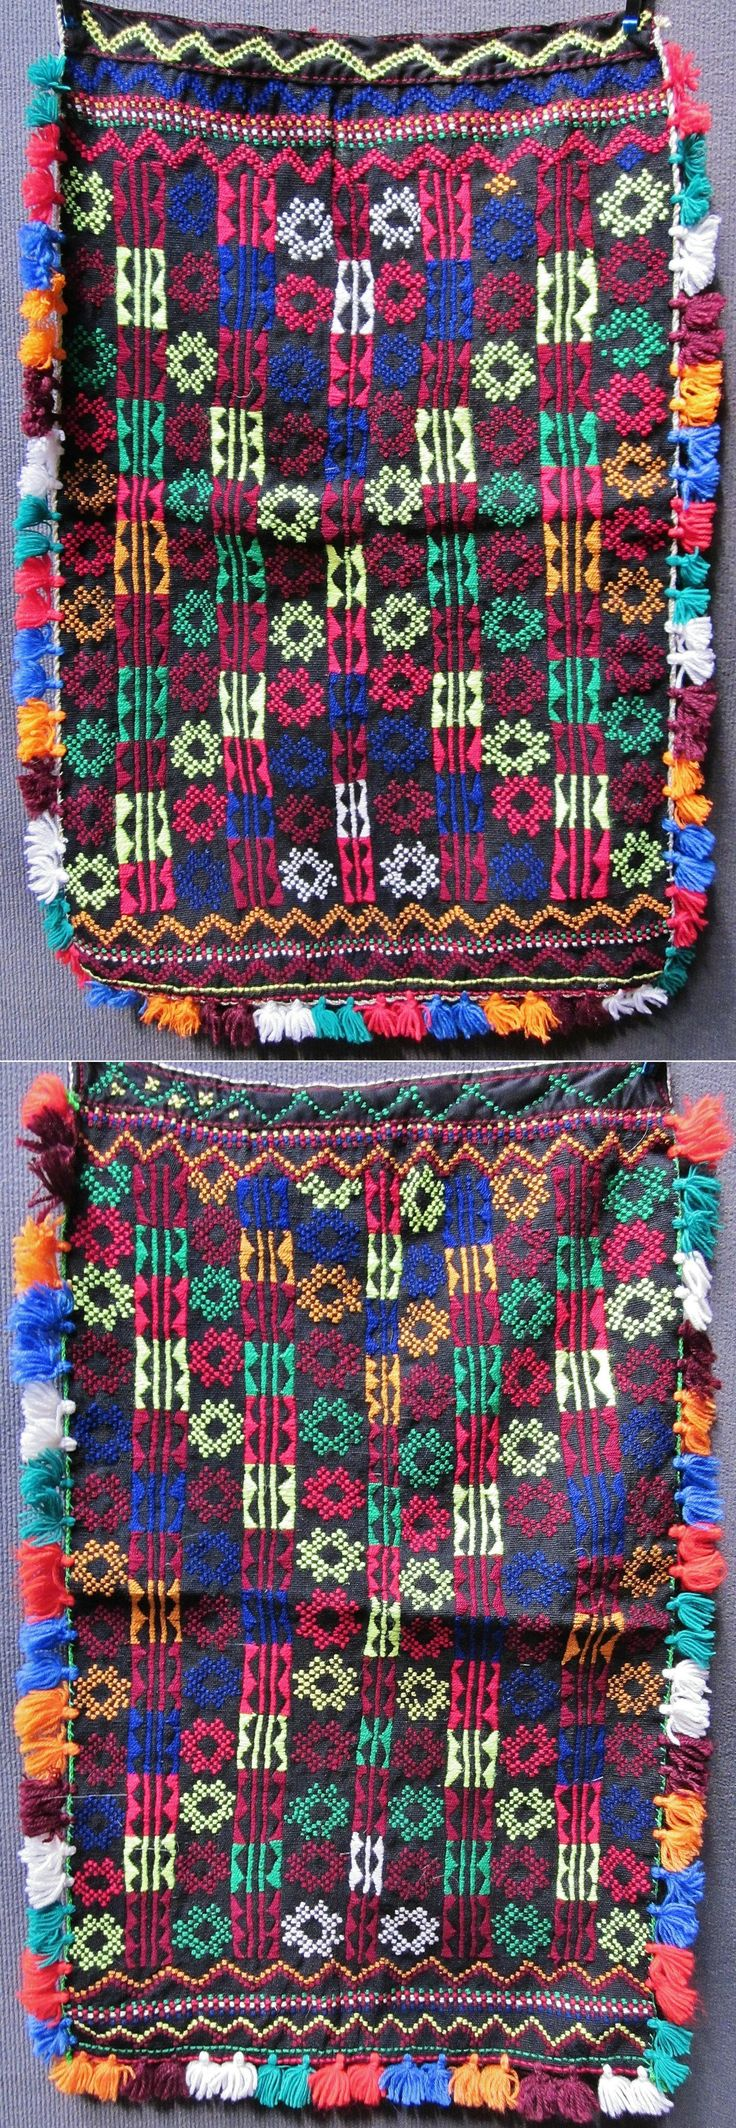 Two traditional woollen 'önlük' (apron) from the Tokat province.  Rural, Alevi Türkmen, ca. 1975. century.  Edged with multicoloured woollen tassels.  The multicoloured design is not embroidered, but woven (in 'zili'-technique).  (Inv.nr. önL012&013 - Kavak Folklor Ekibi & Costume Collection-Antwerpen/Belgium).